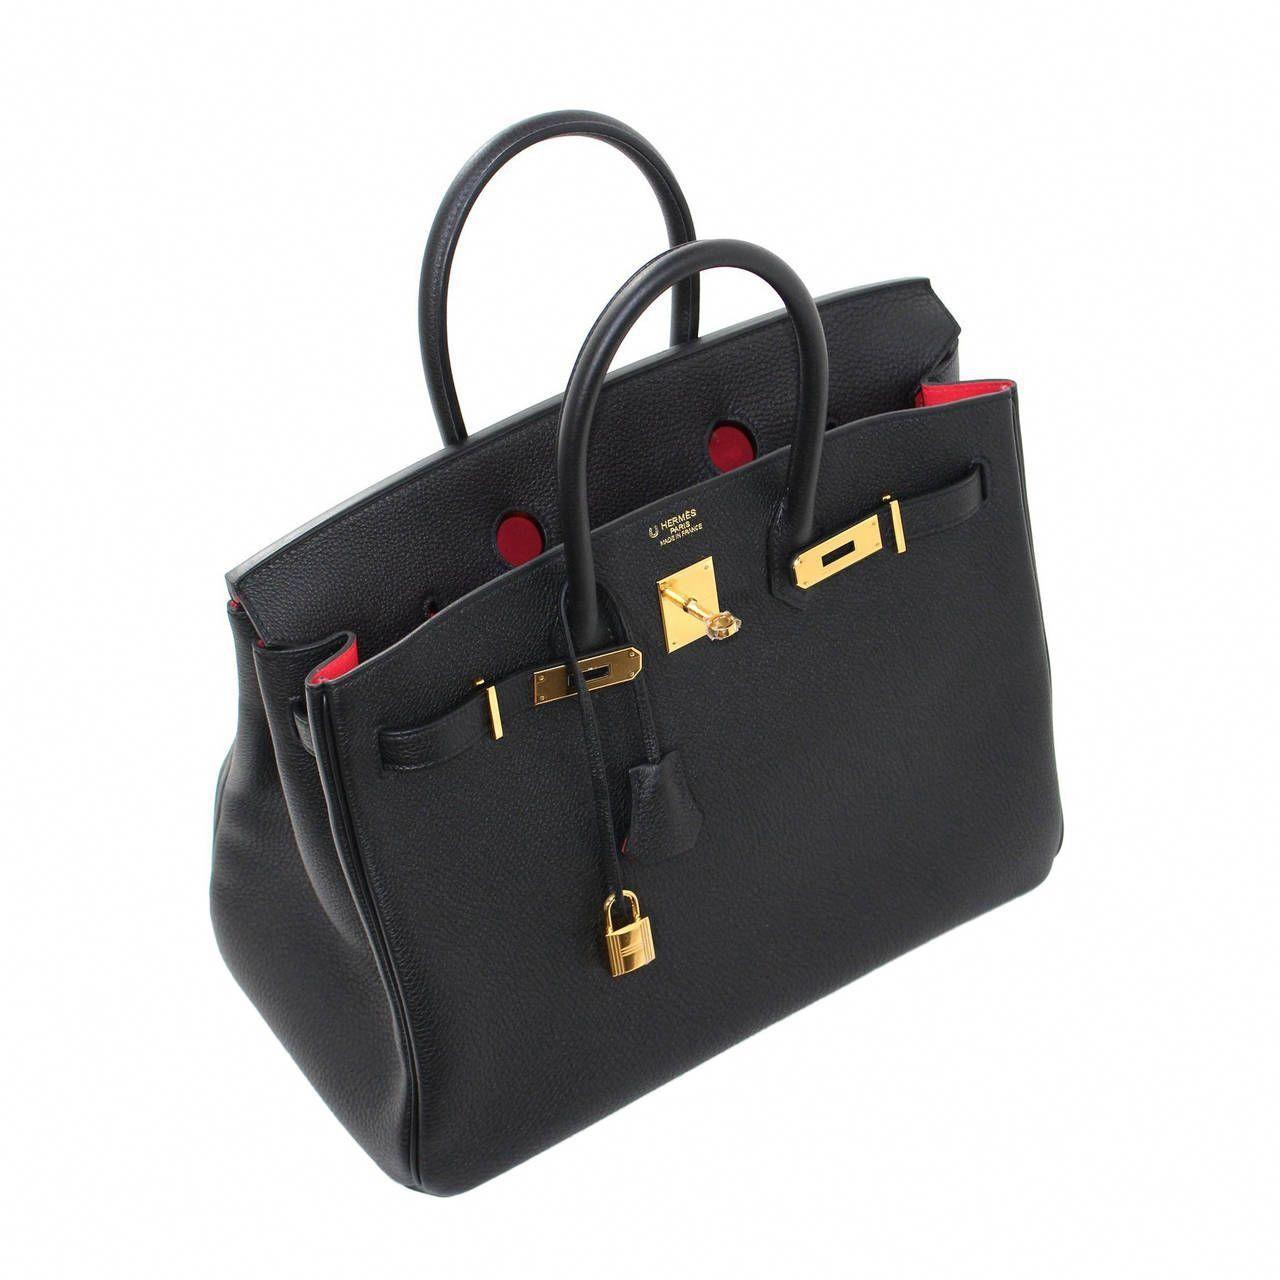 288c67300507 Hermès Horseshoe Birkin Bag in Black Togo with Rose Jaipur